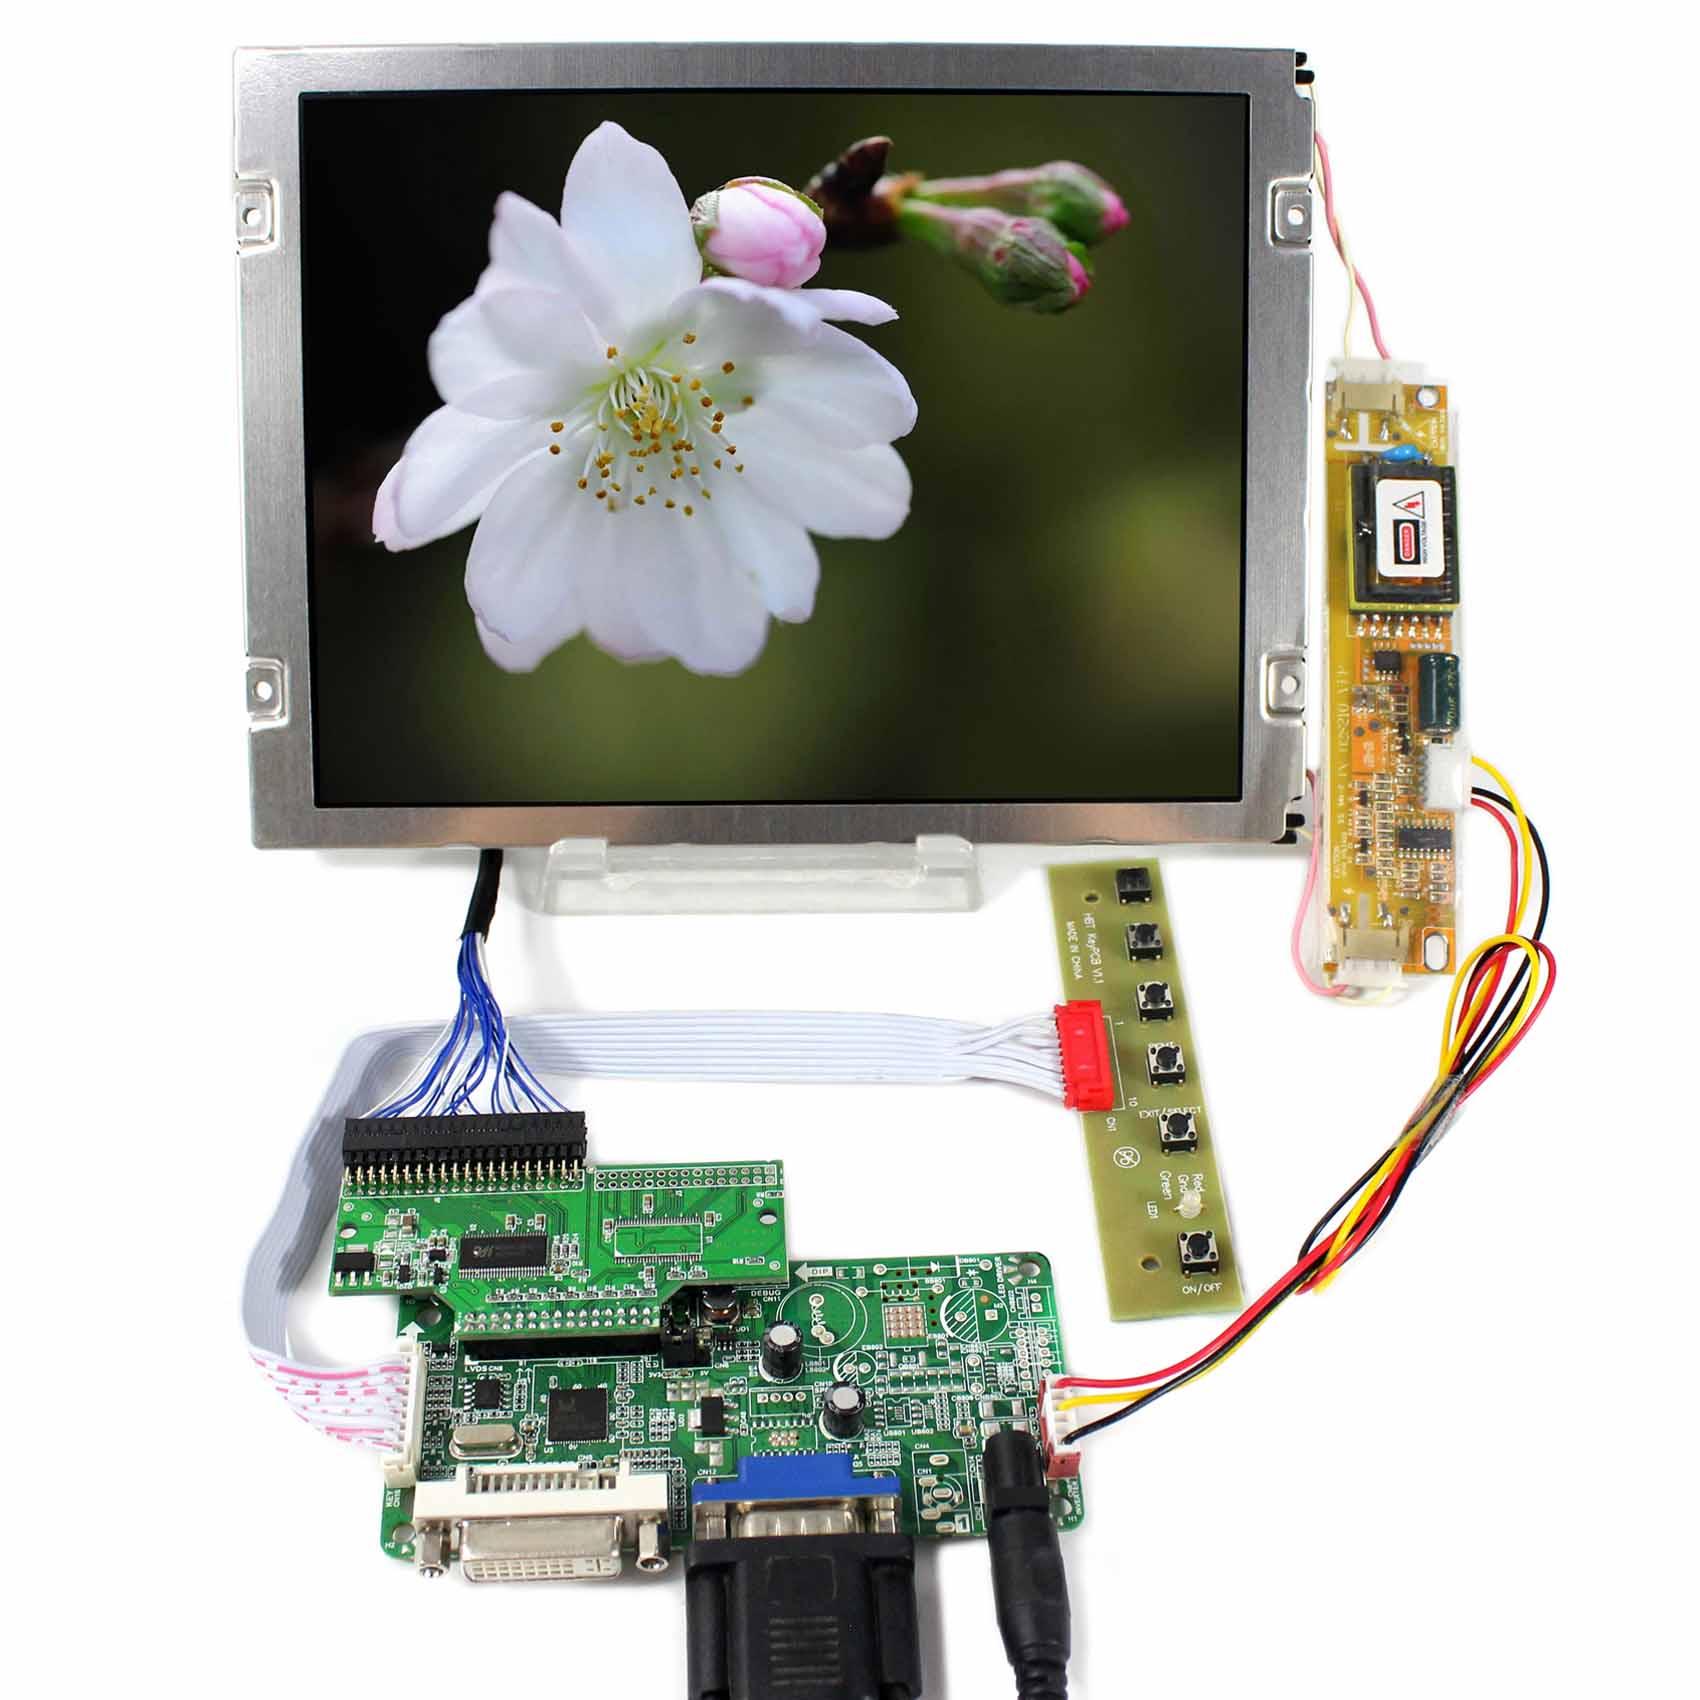 AA084VC03 RT2281 8.4inch LCD Screen Backlight  2CCFL 640x480  VGA DVI LCD Controller BoardAA084VC03 RT2281 8.4inch LCD Screen Backlight  2CCFL 640x480  VGA DVI LCD Controller Board